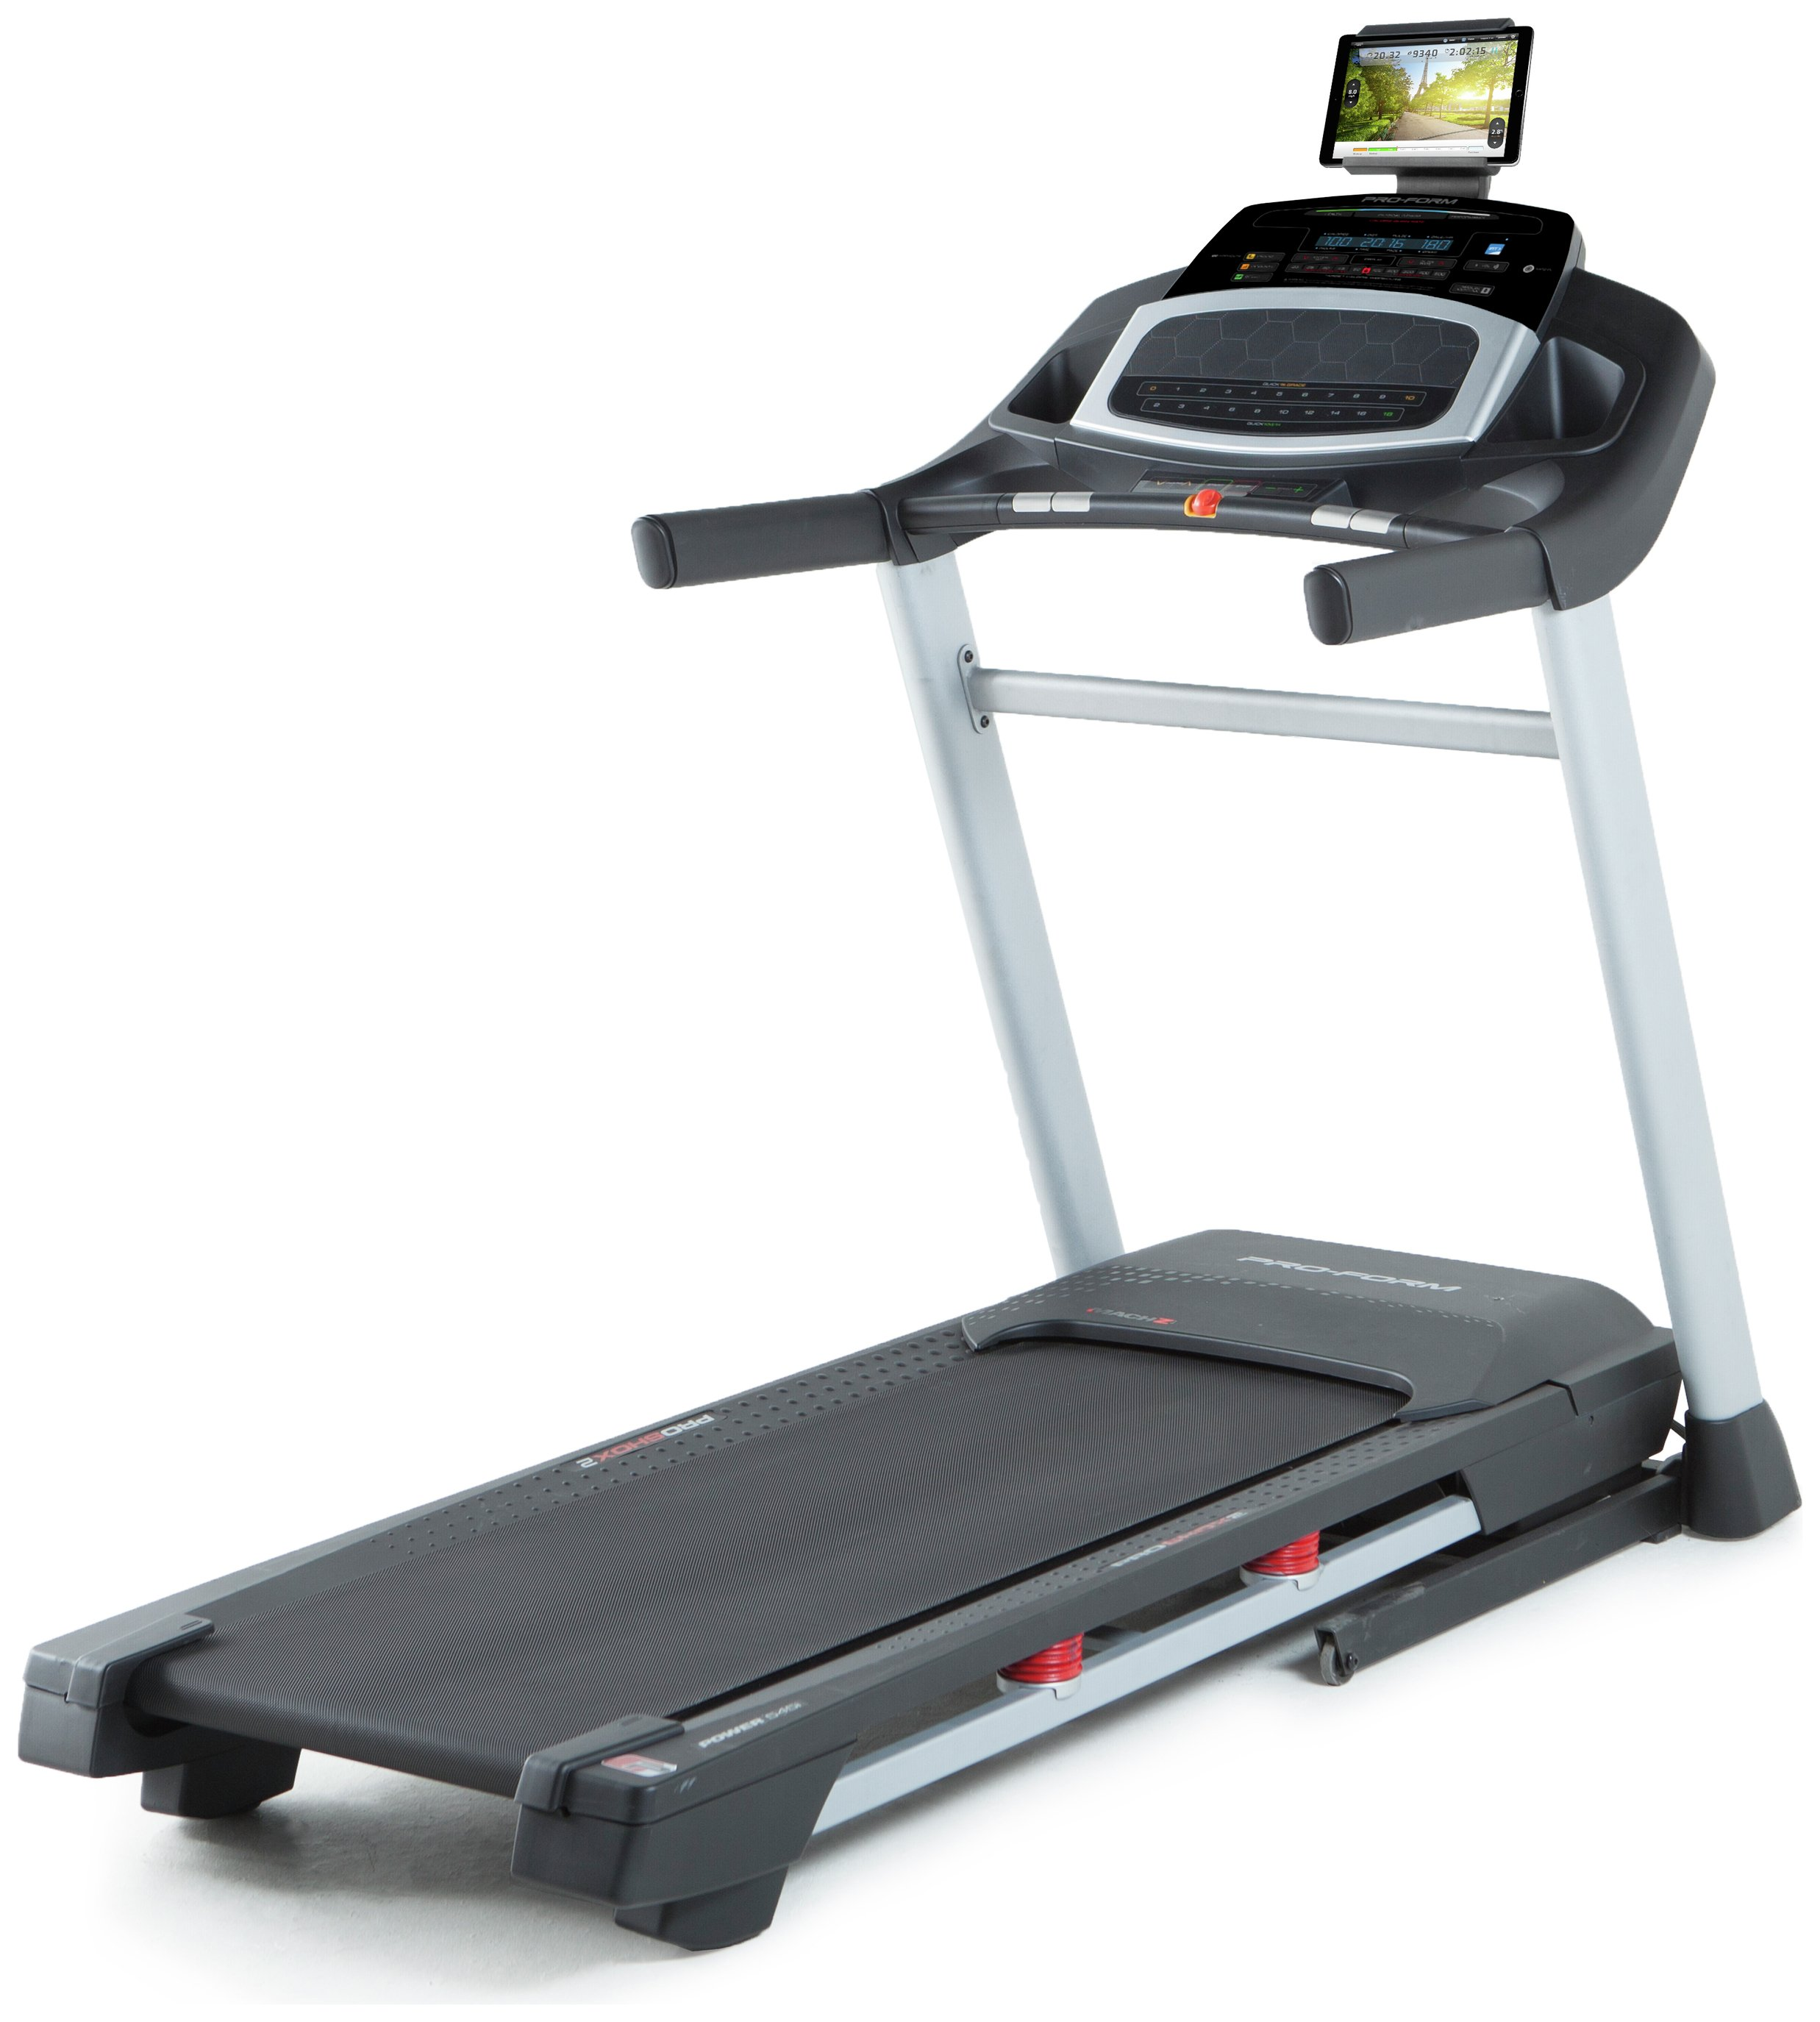 york pacer 2750. proform power 545i treadmill york pacer 2750